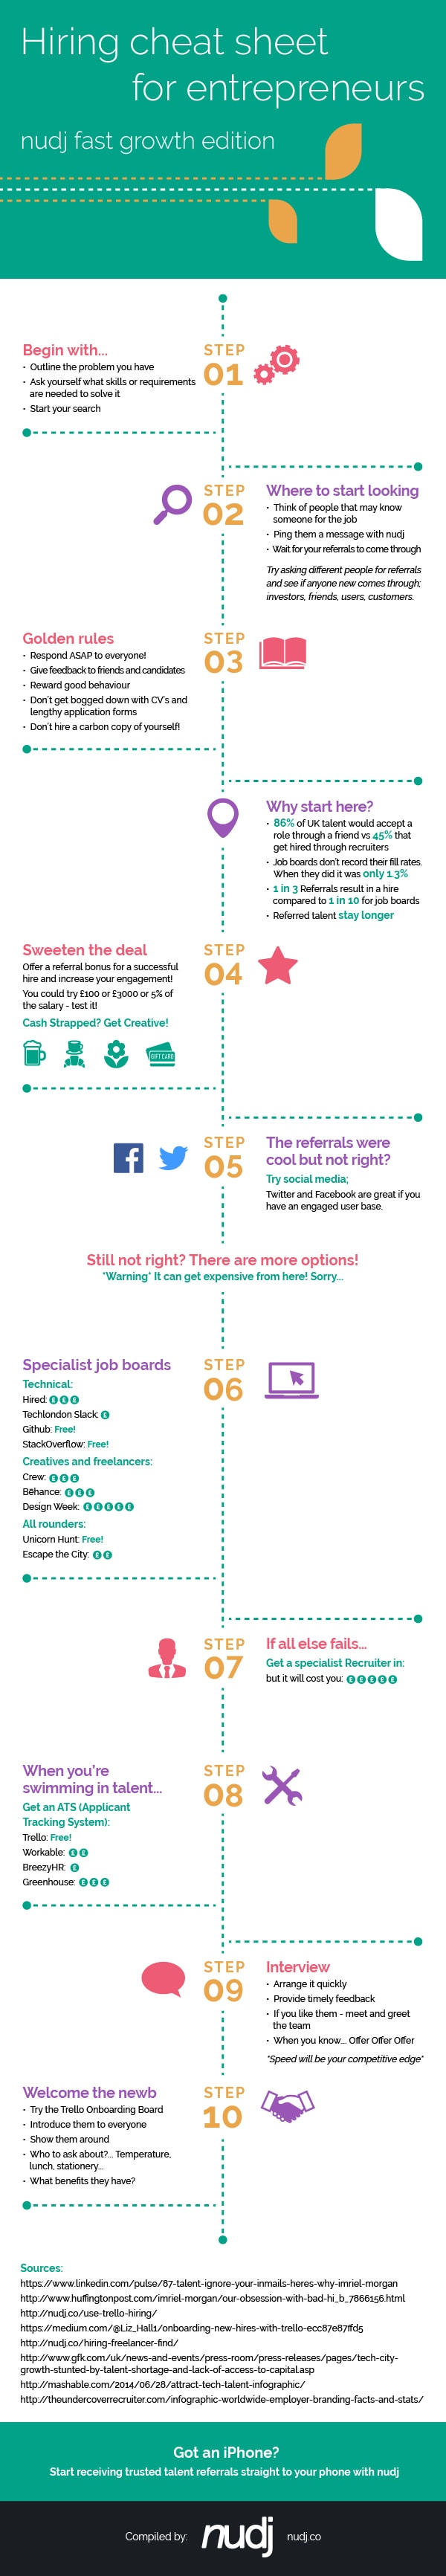 nudj-infographic-2